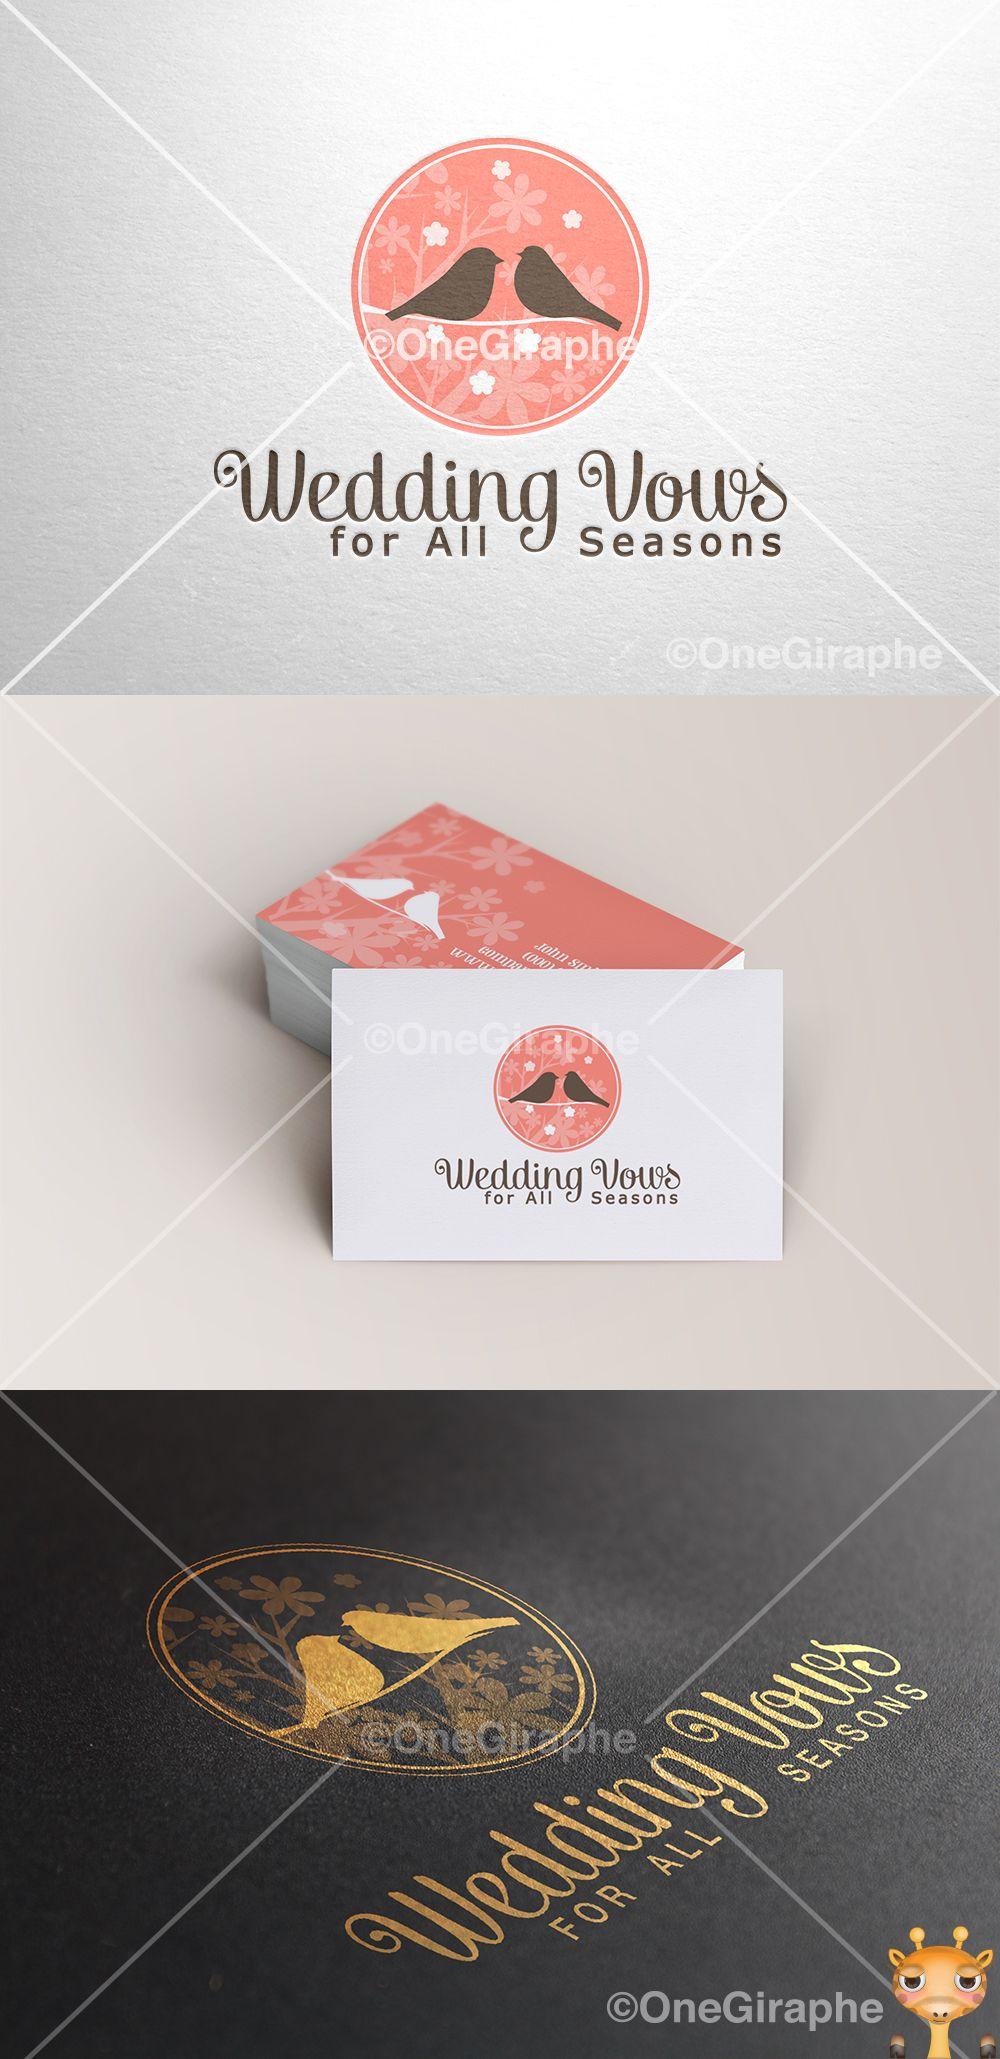 www.One-Giraphe.com #wedding #gold #bird #logo #logodesign #cute #graphic #design #designer #portfolio #behance #logopond #brandstack #sweet #logodesign #designer #brand #brandidentity #brandstack #logo #logodesign #graphicdesign #logopond #behance #craft #paper #letterpress #pattern #badge #portfolio #flower